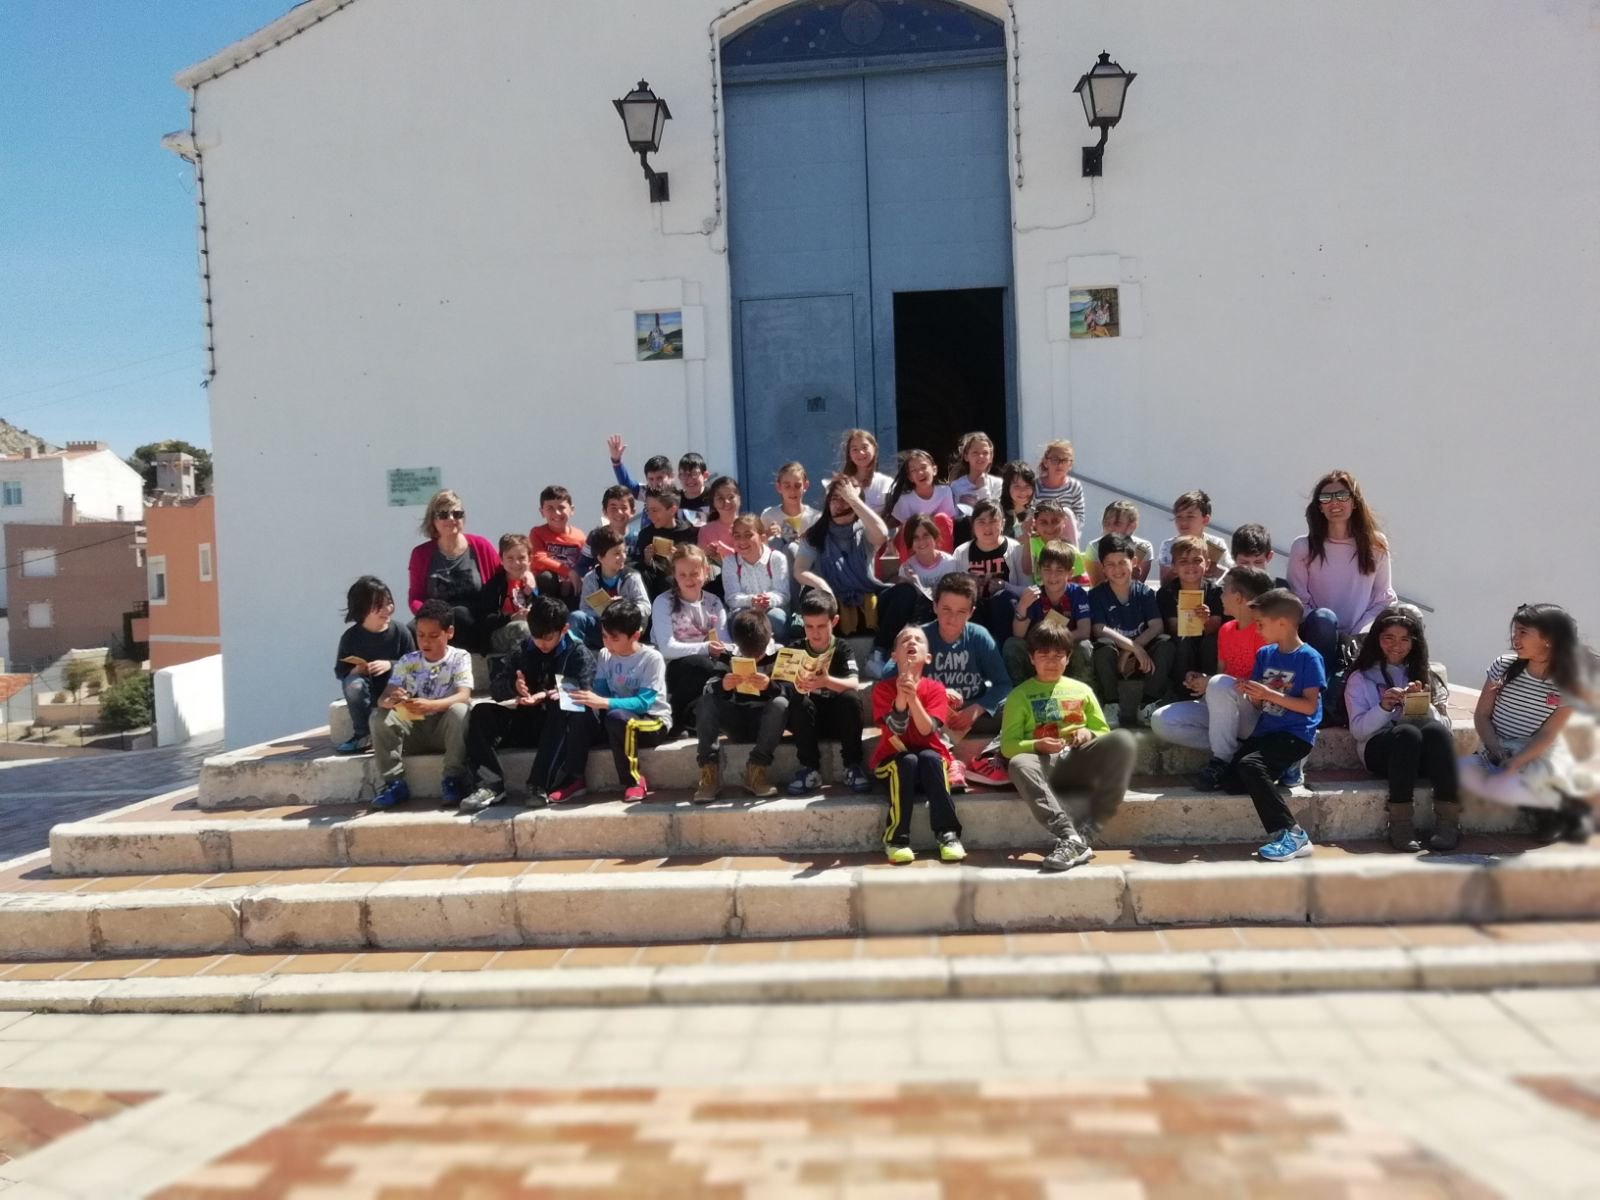 (2018-04-18) - Visita ermita alumnos Beatriz-Carmina-Lucía,3º,La Foia - María Isabel Berenguer Brotons - (06)